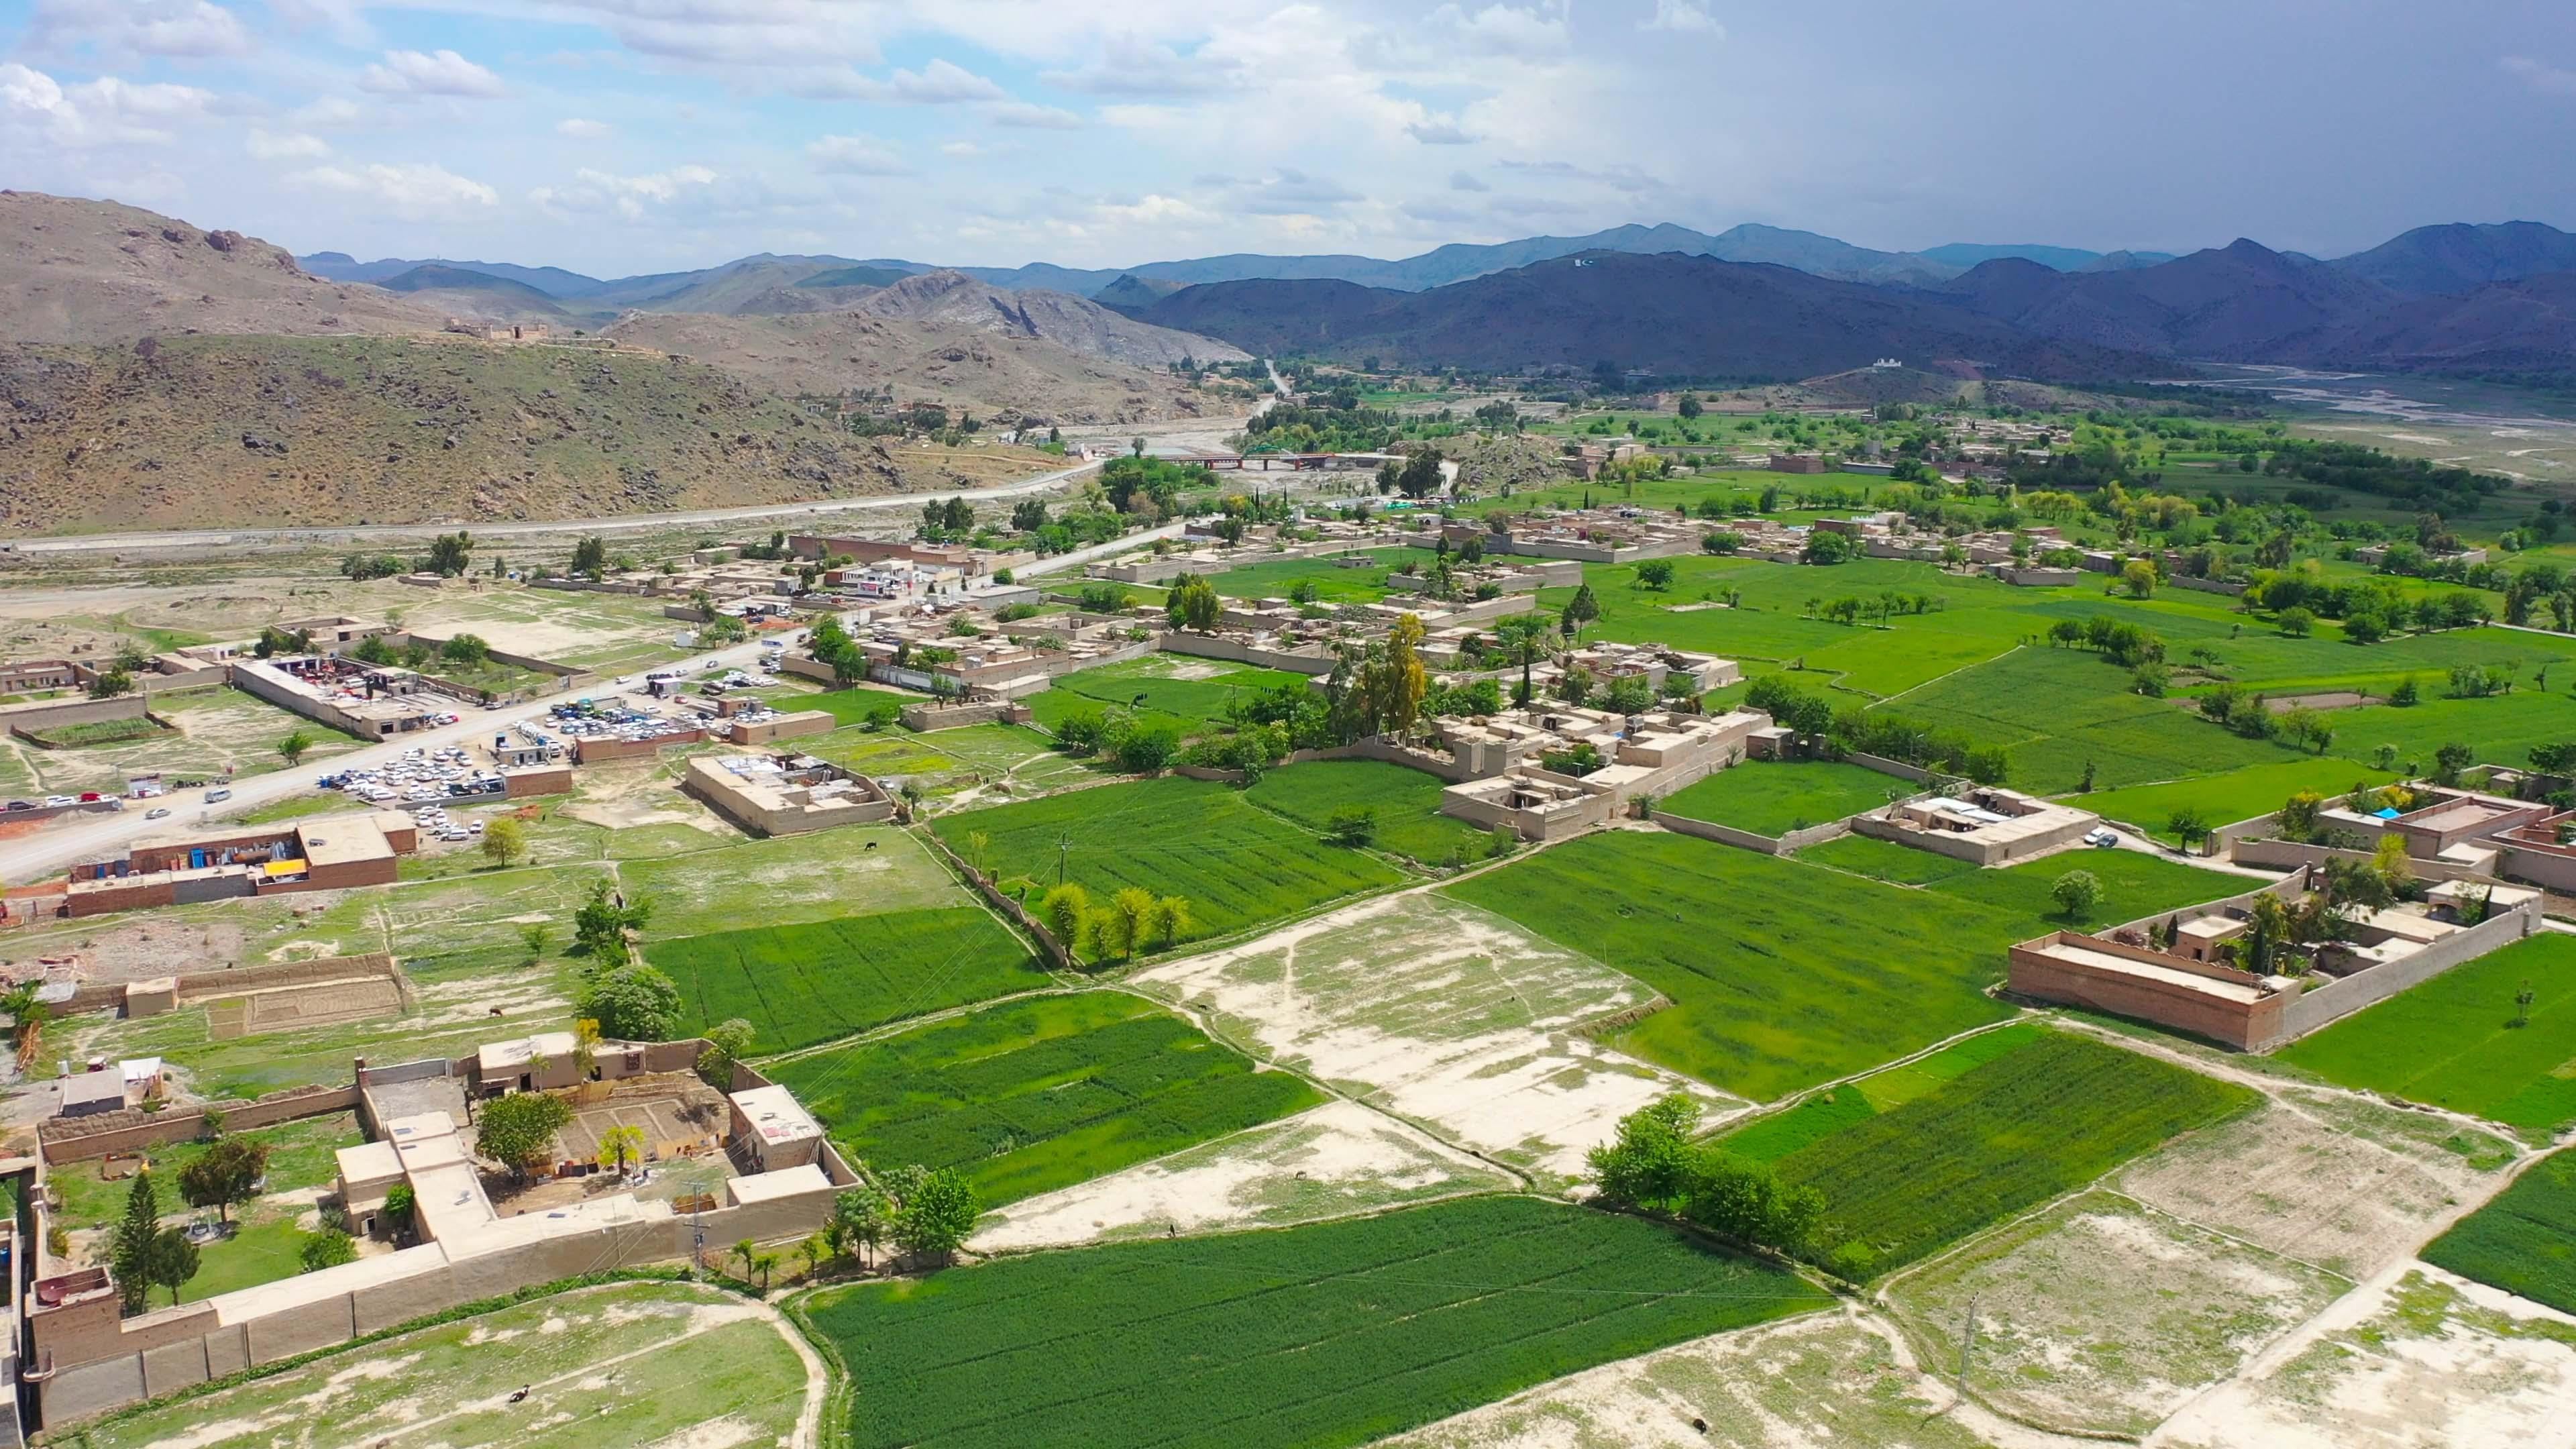 Miranshah border region near afghanistan, Waziristan province